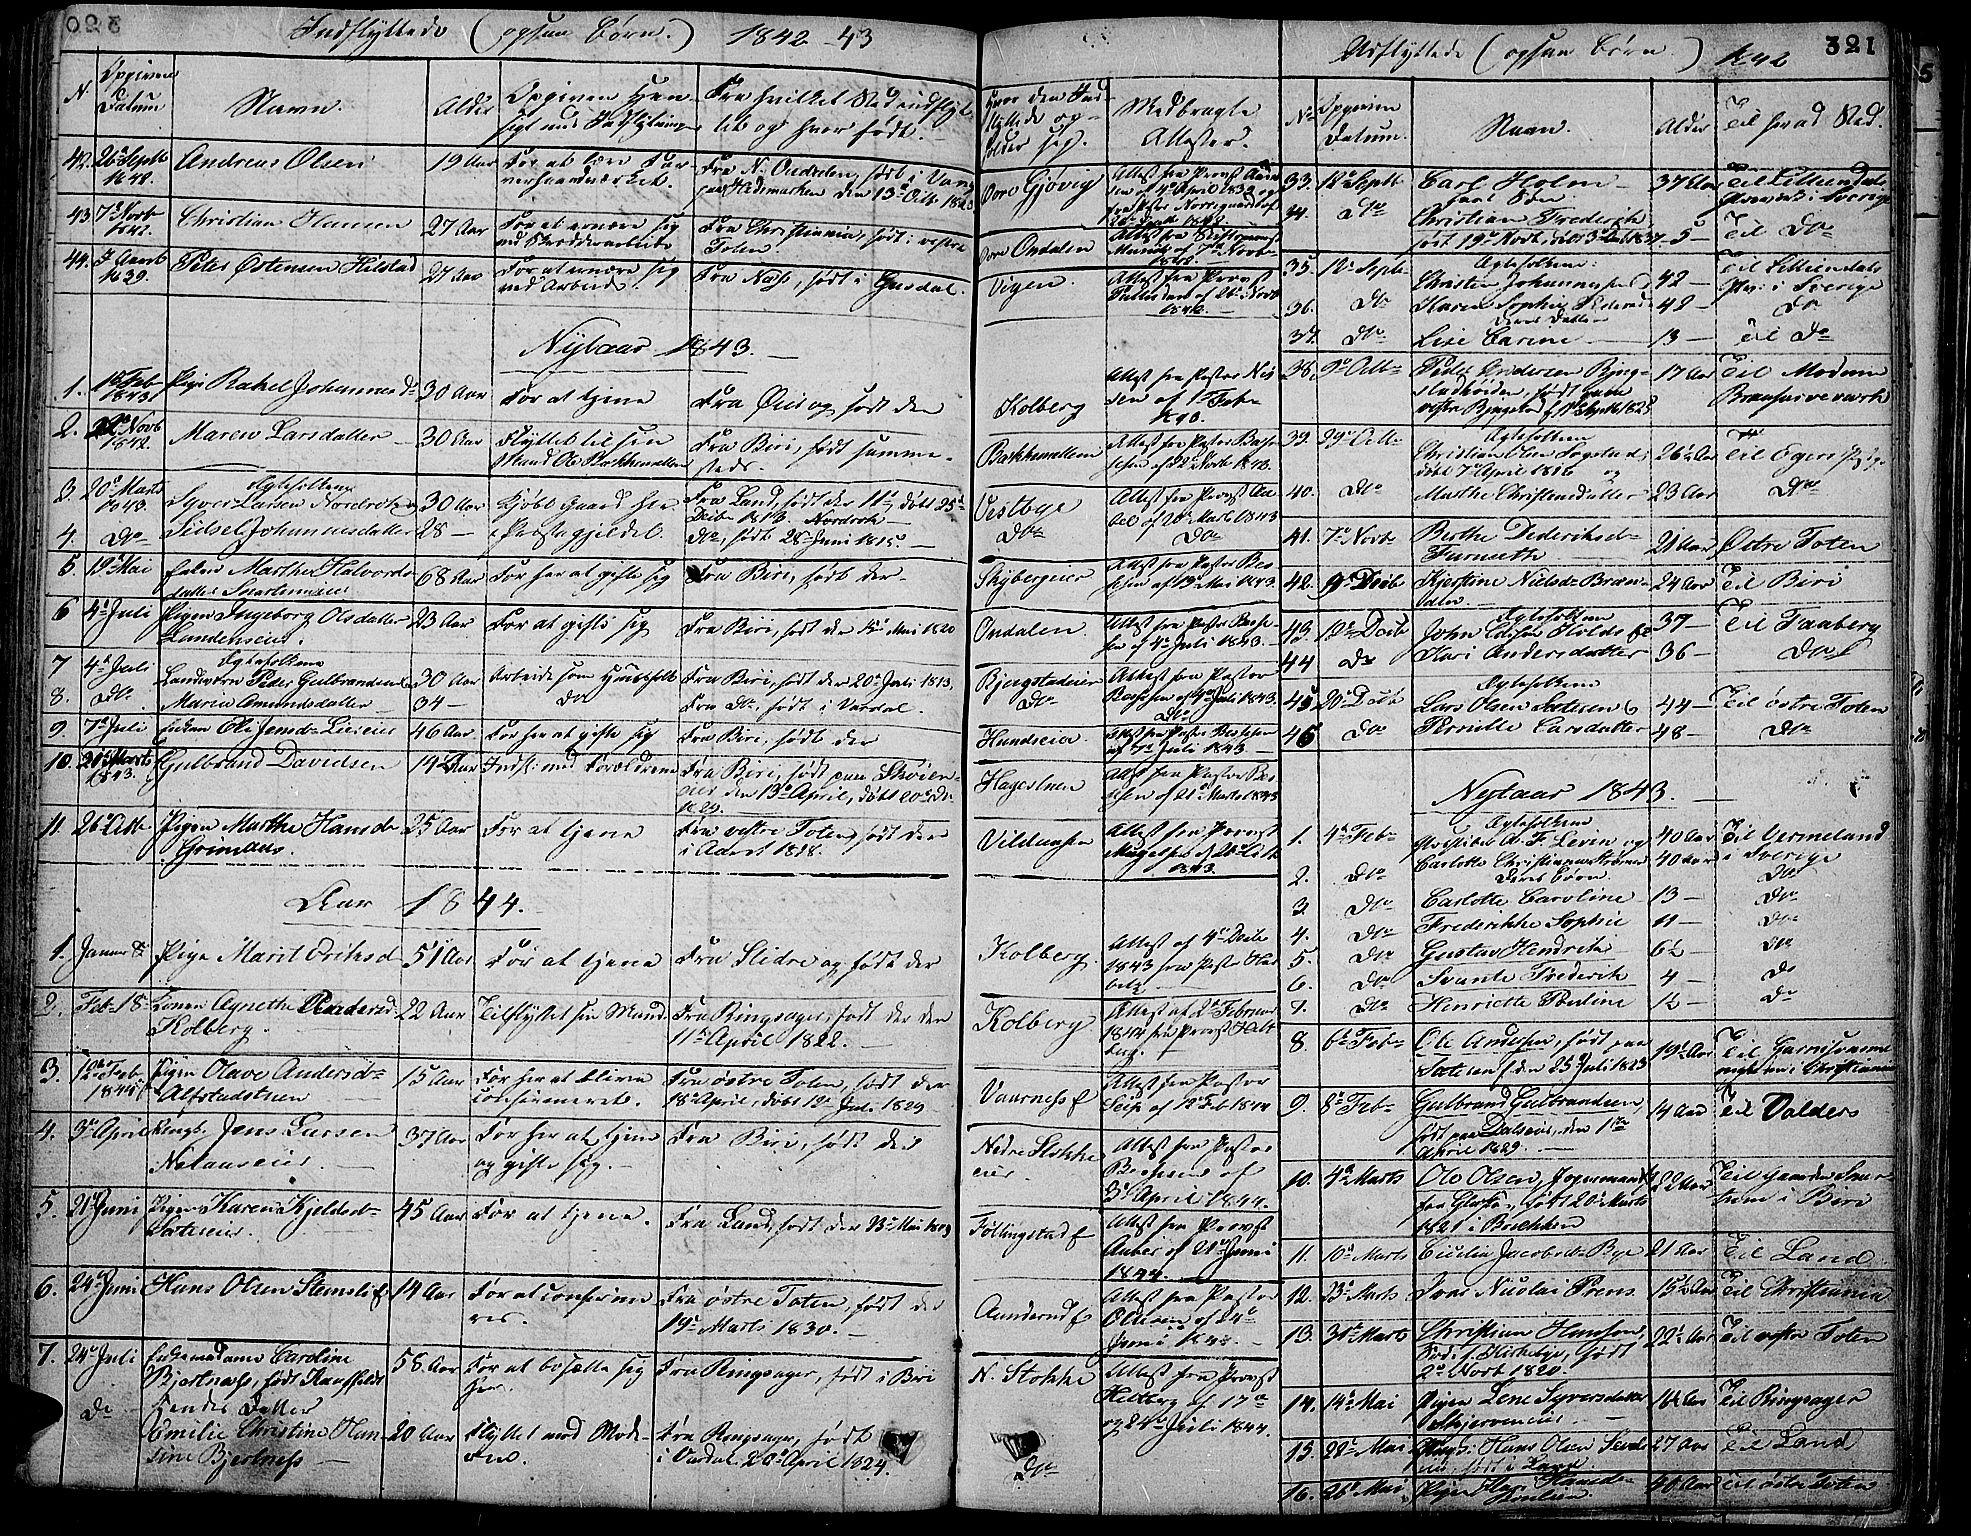 SAH, Vardal prestekontor, H/Ha/Hab/L0004: Klokkerbok nr. 4, 1831-1853, s. 321